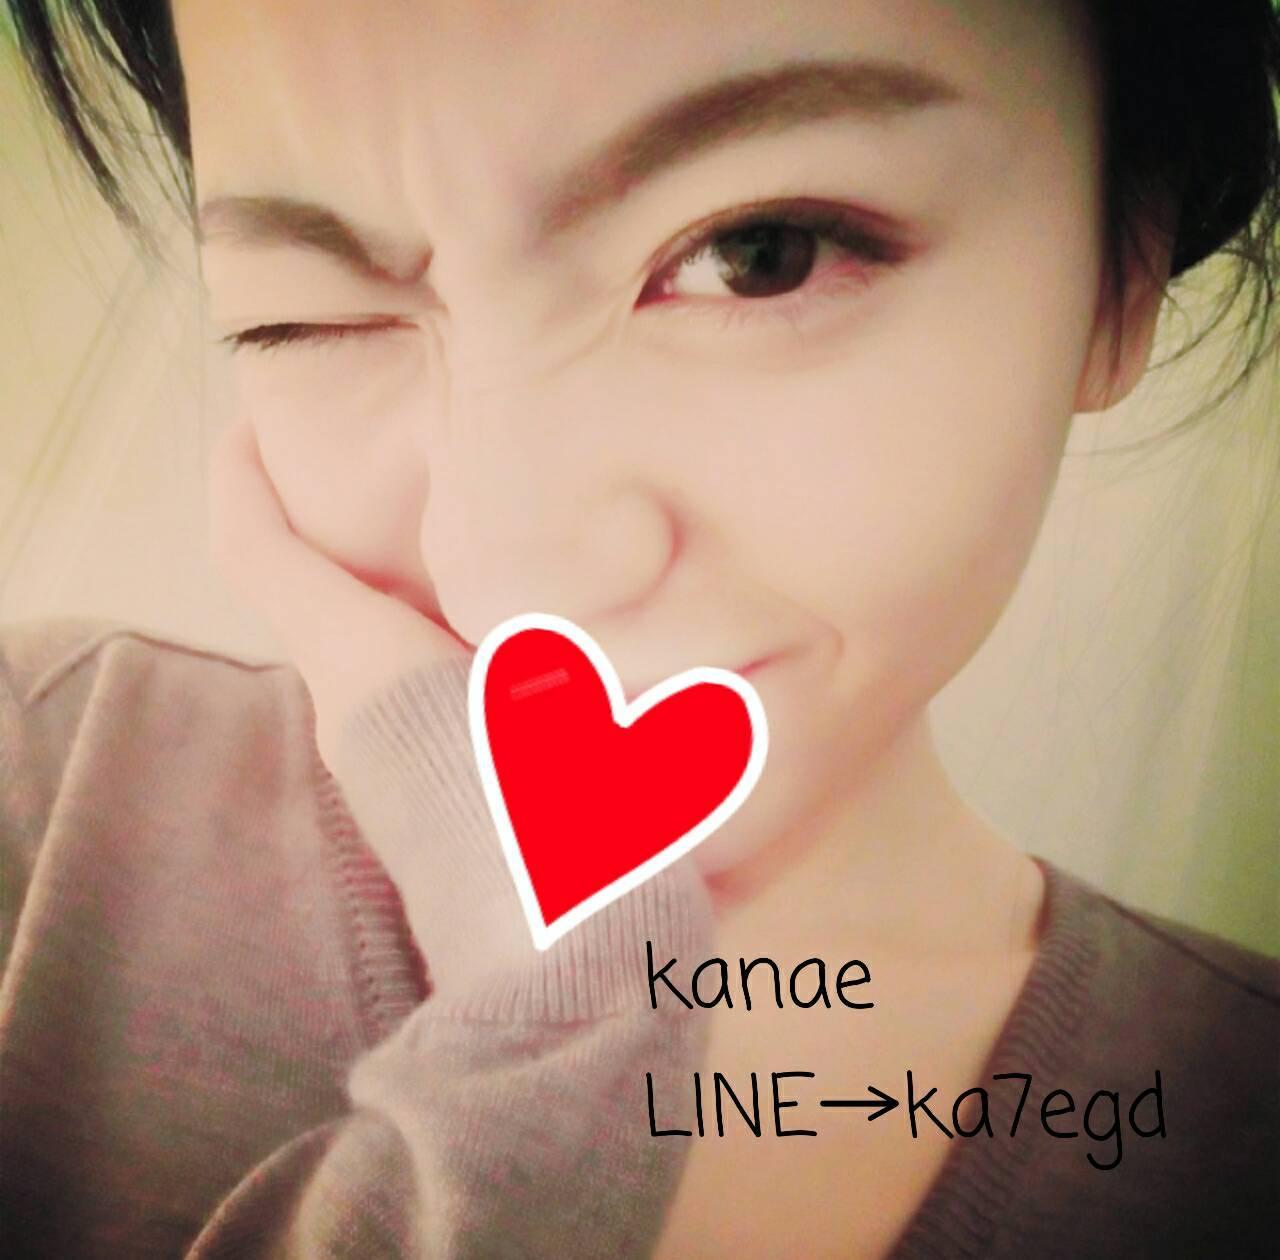 kanae-binary